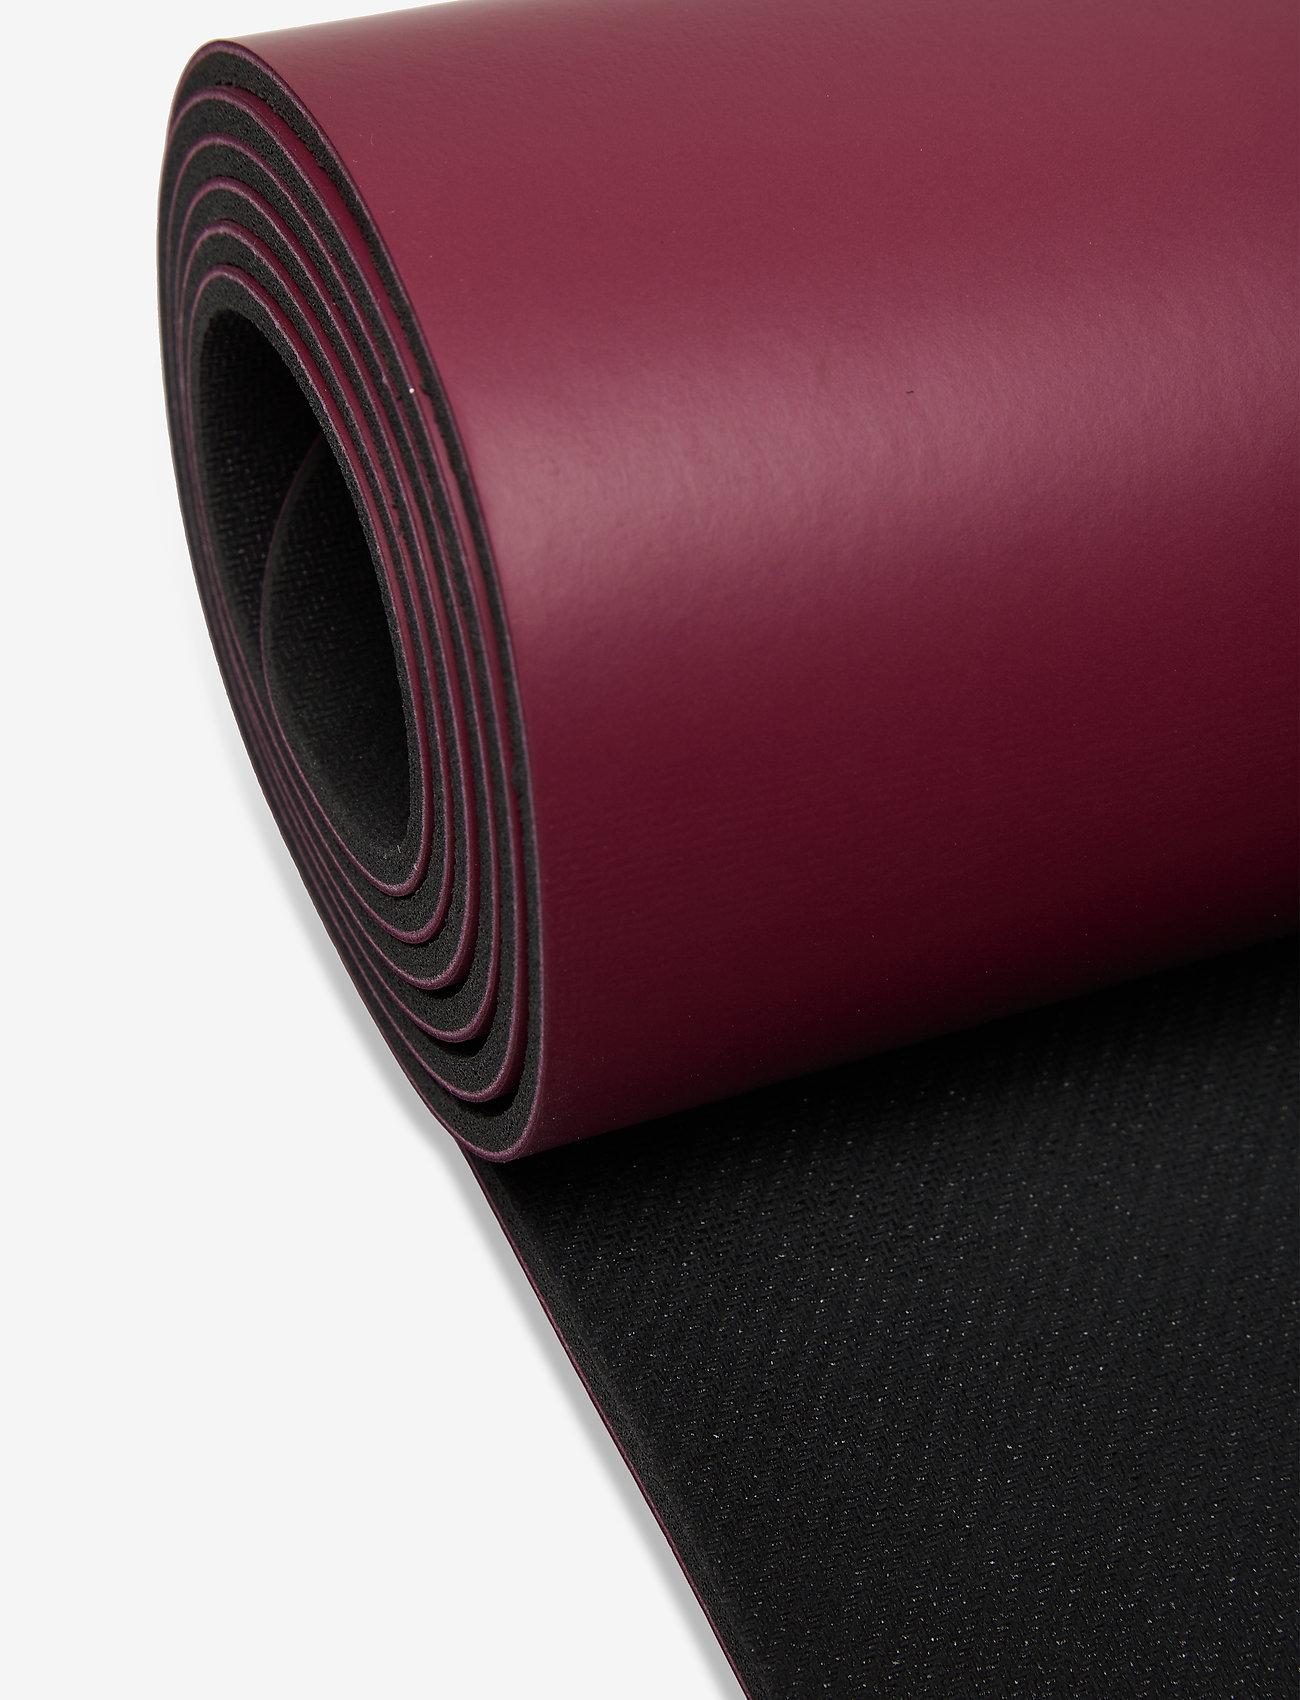 Moonchild Yoga Wear - Moonchild Yoga Mat - yogamatten en -accessoires - plum - 1